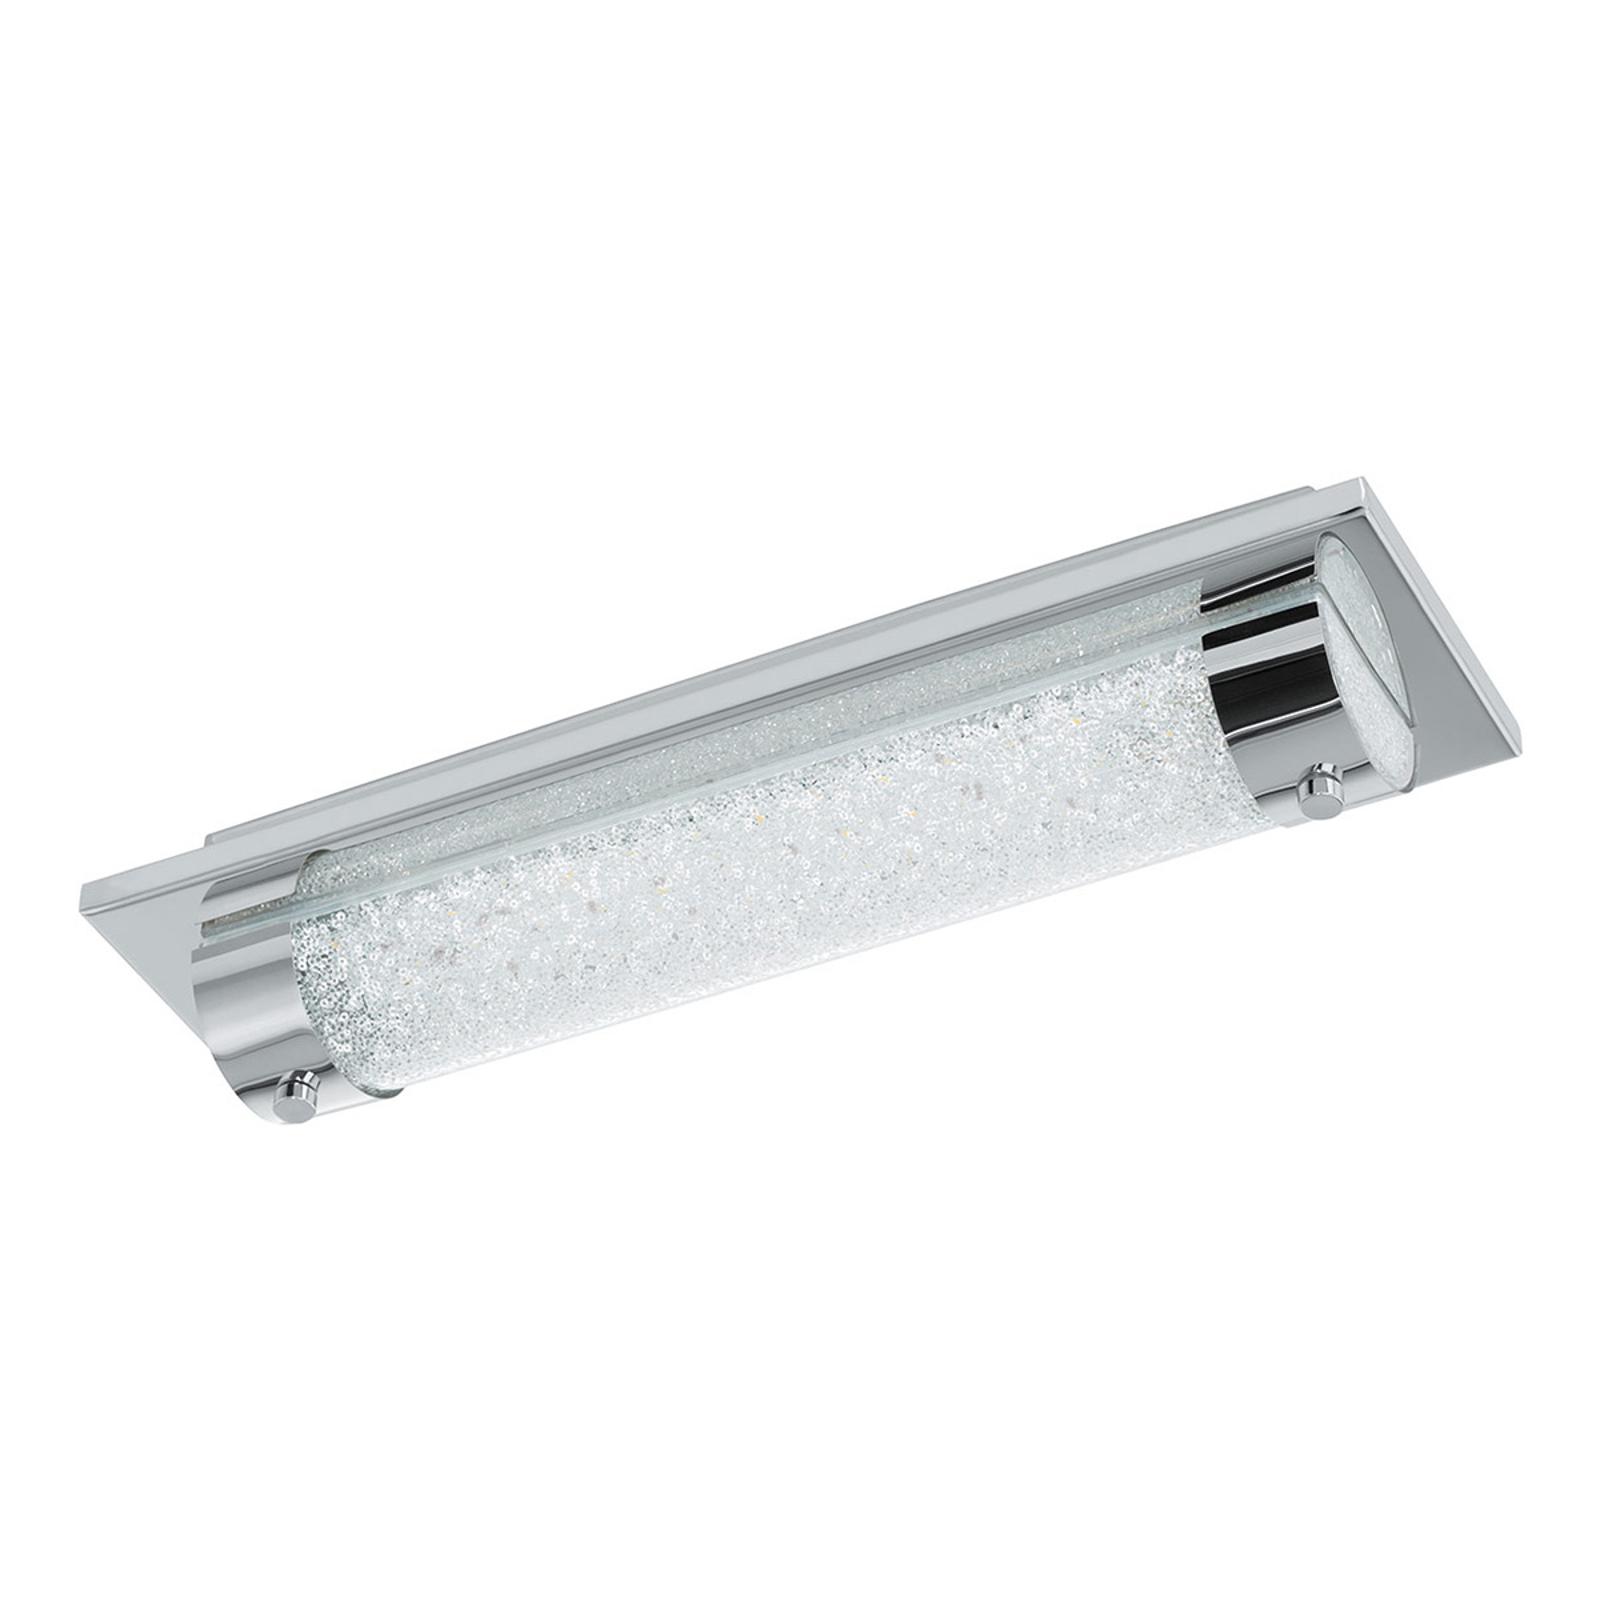 Tolorico LED-loftlampe, længde 35 cm